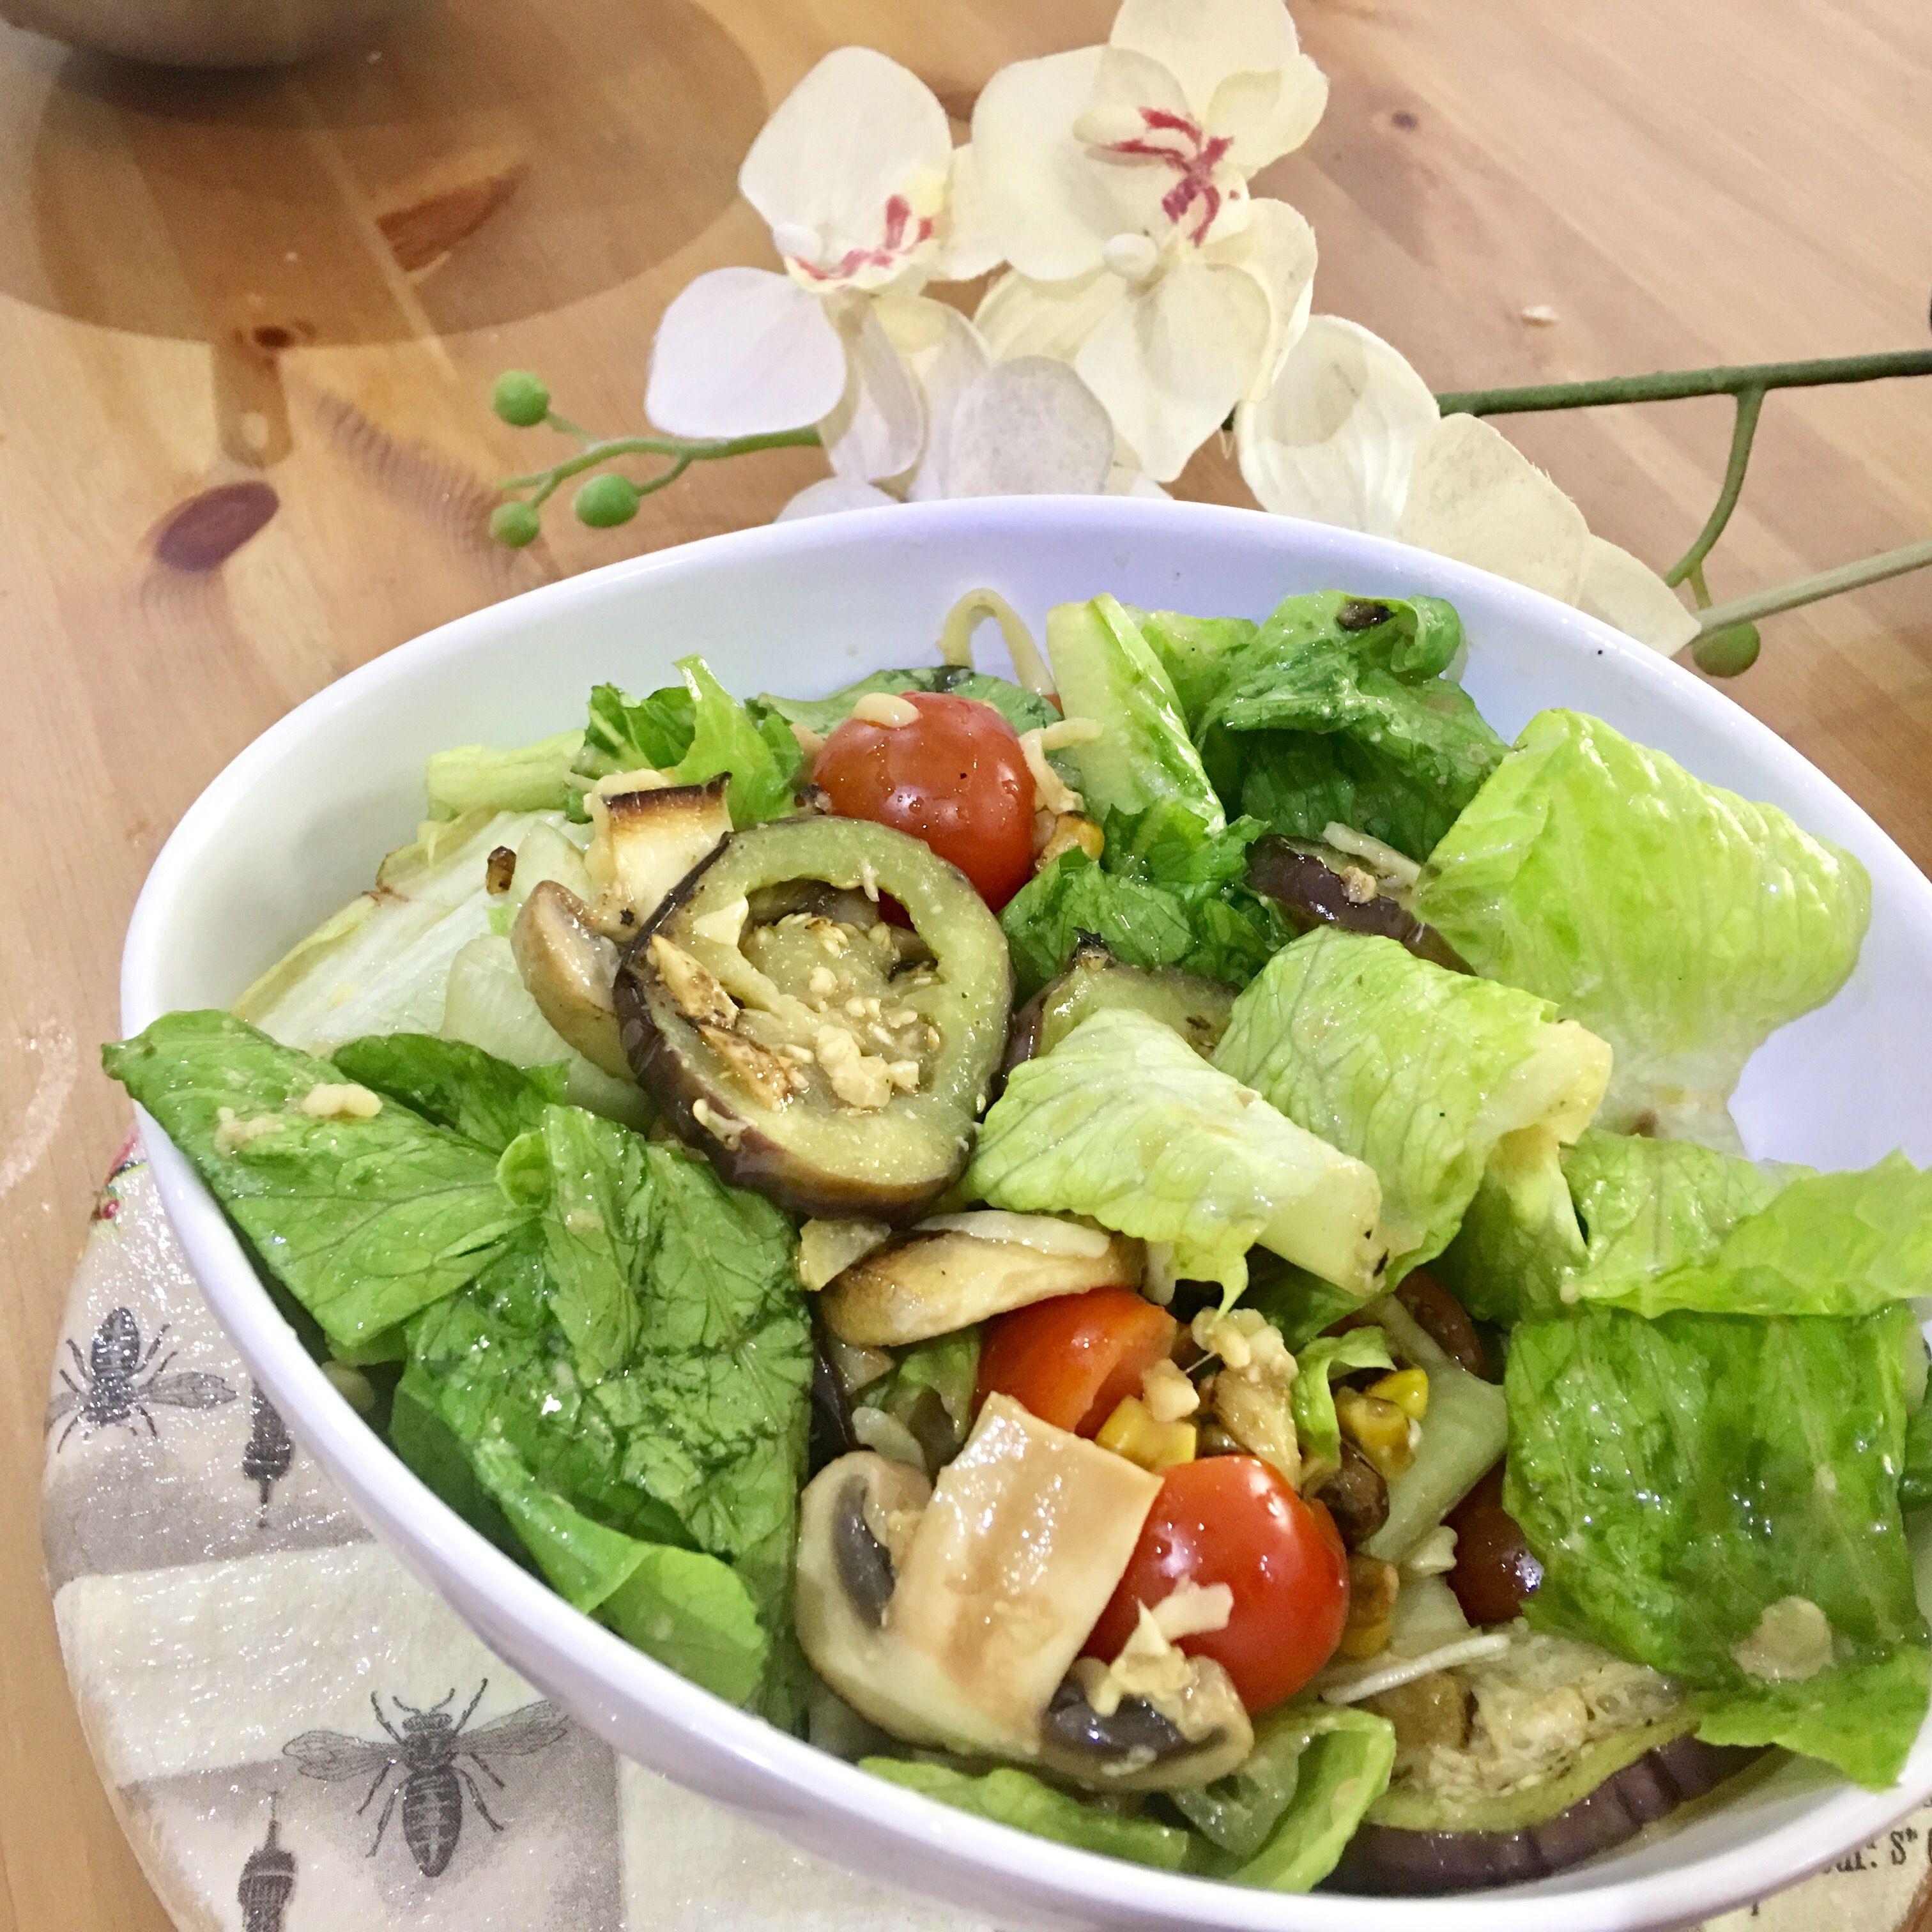 Pin By Ayu Tanimoto On Masakan Indonesia Cobb Salad Food Cobb